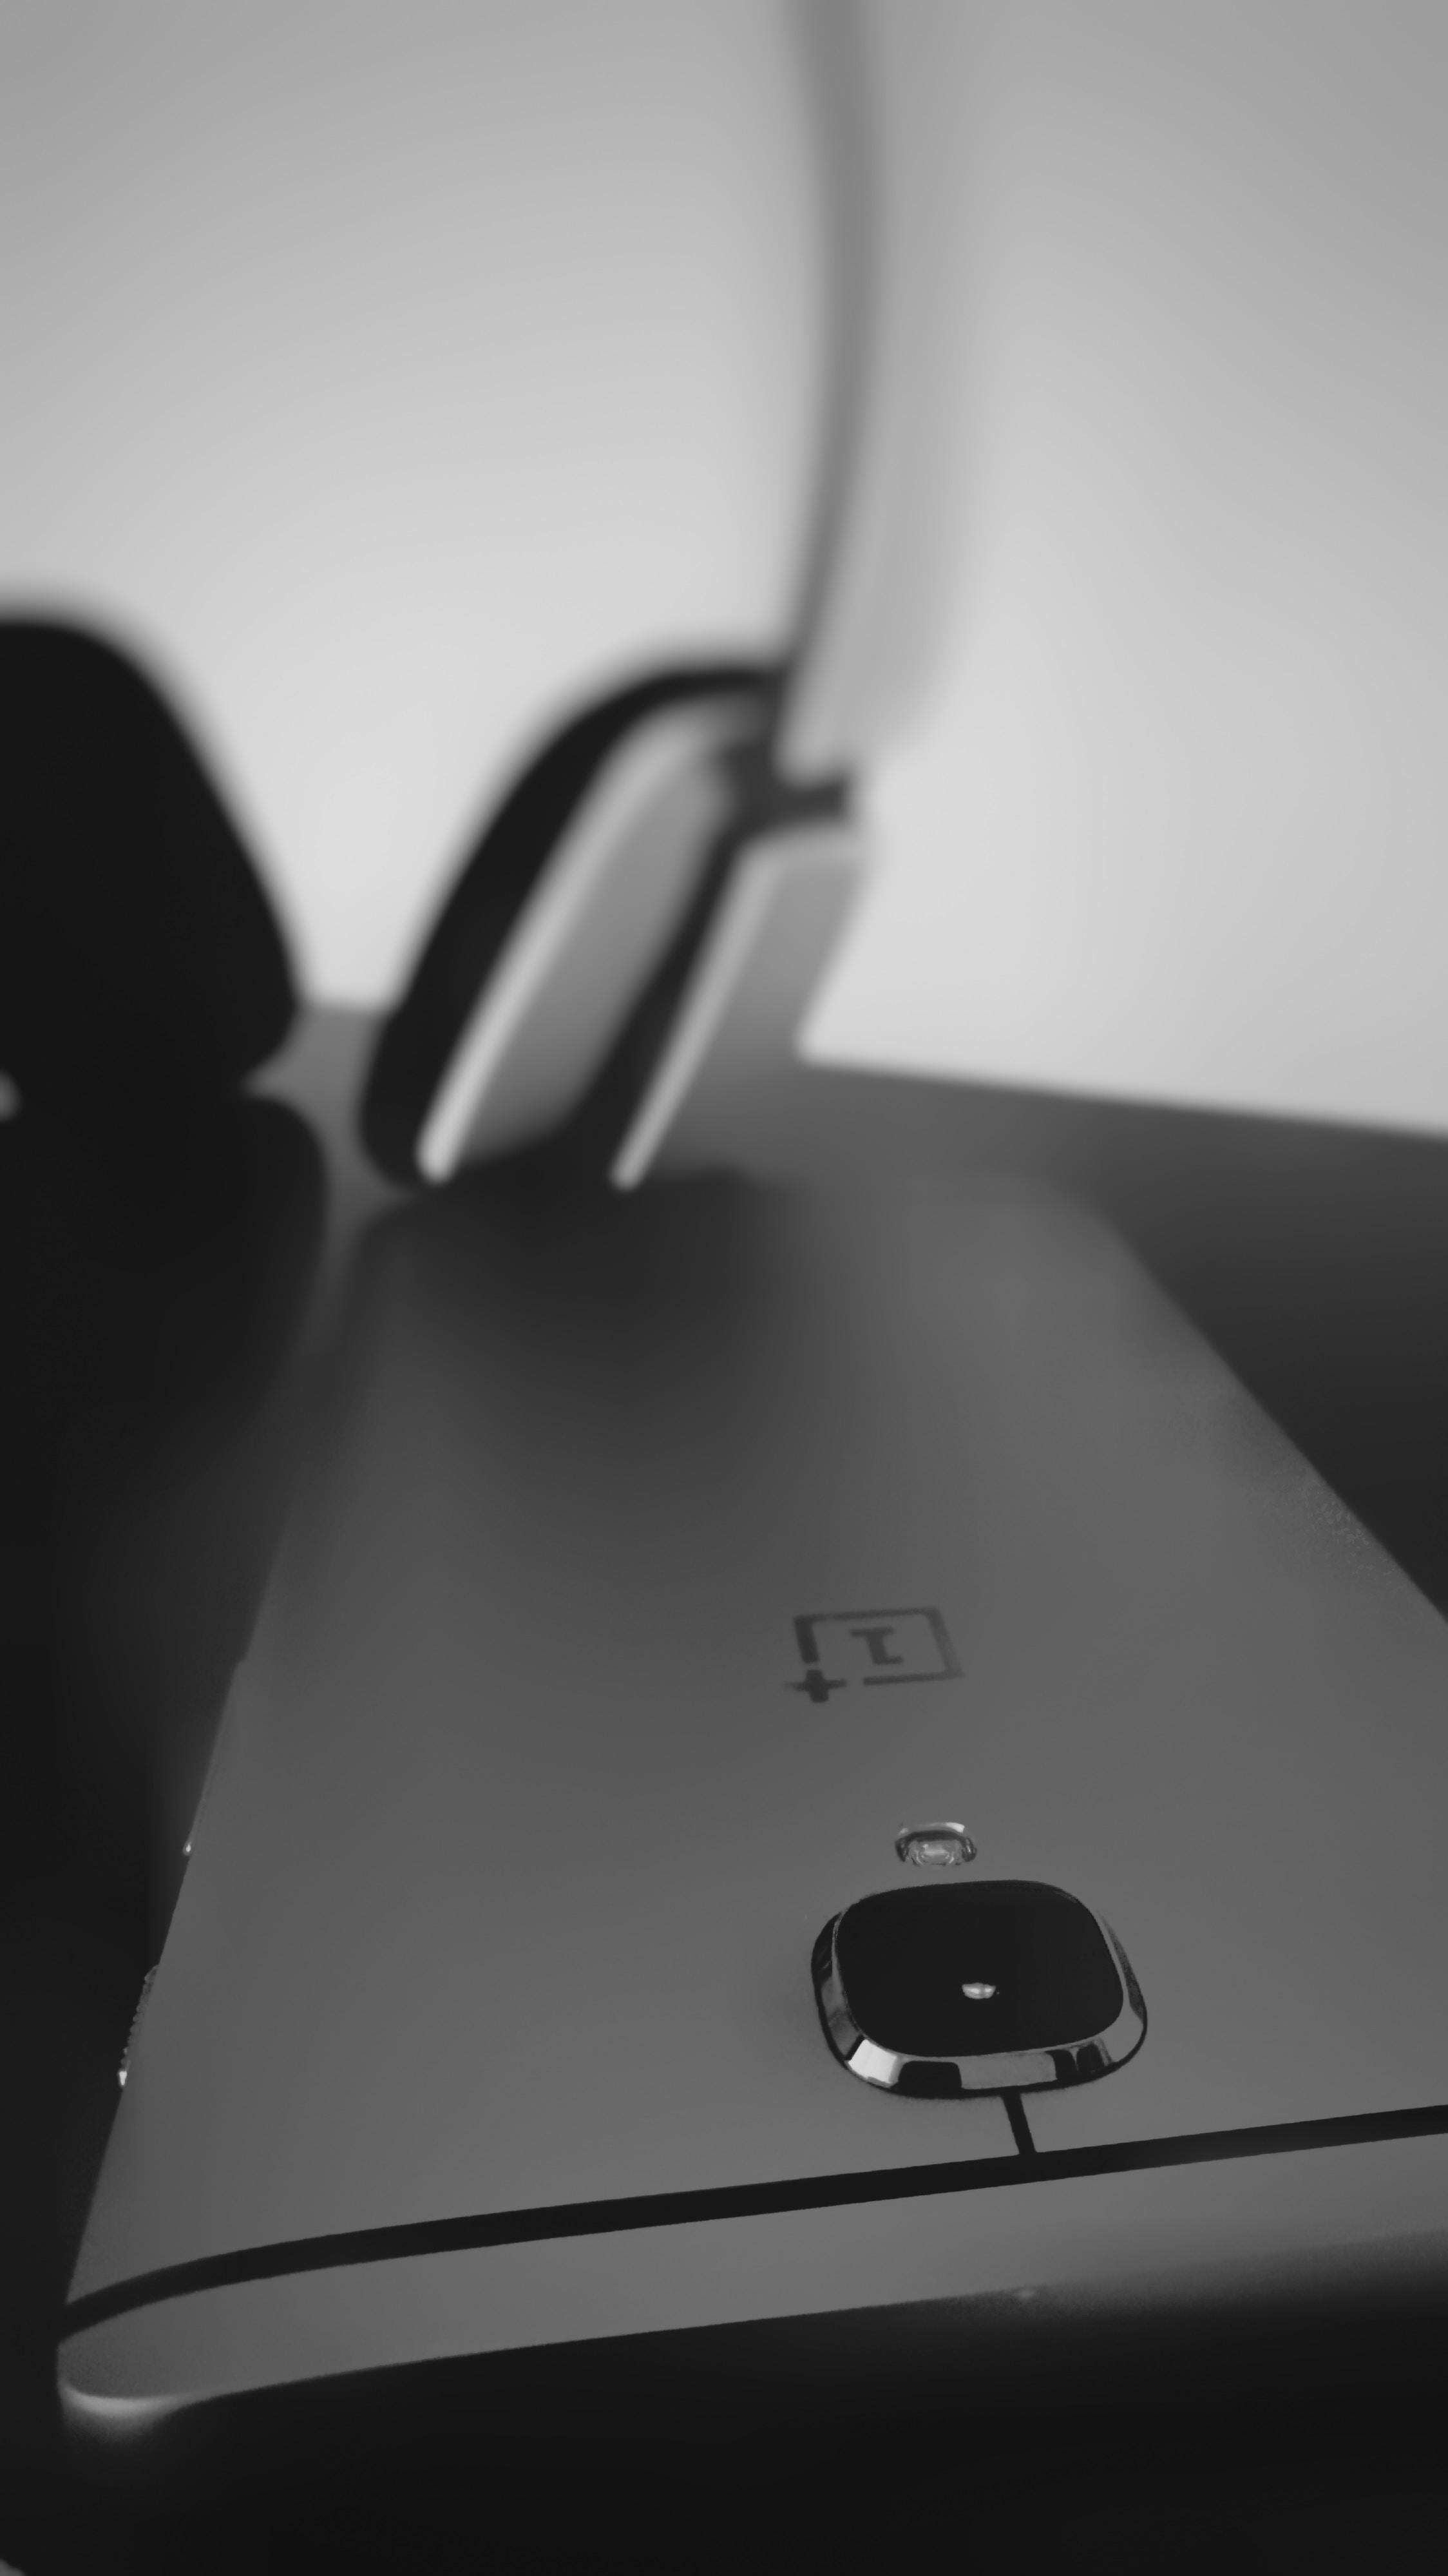 A black smartphone near headphones.